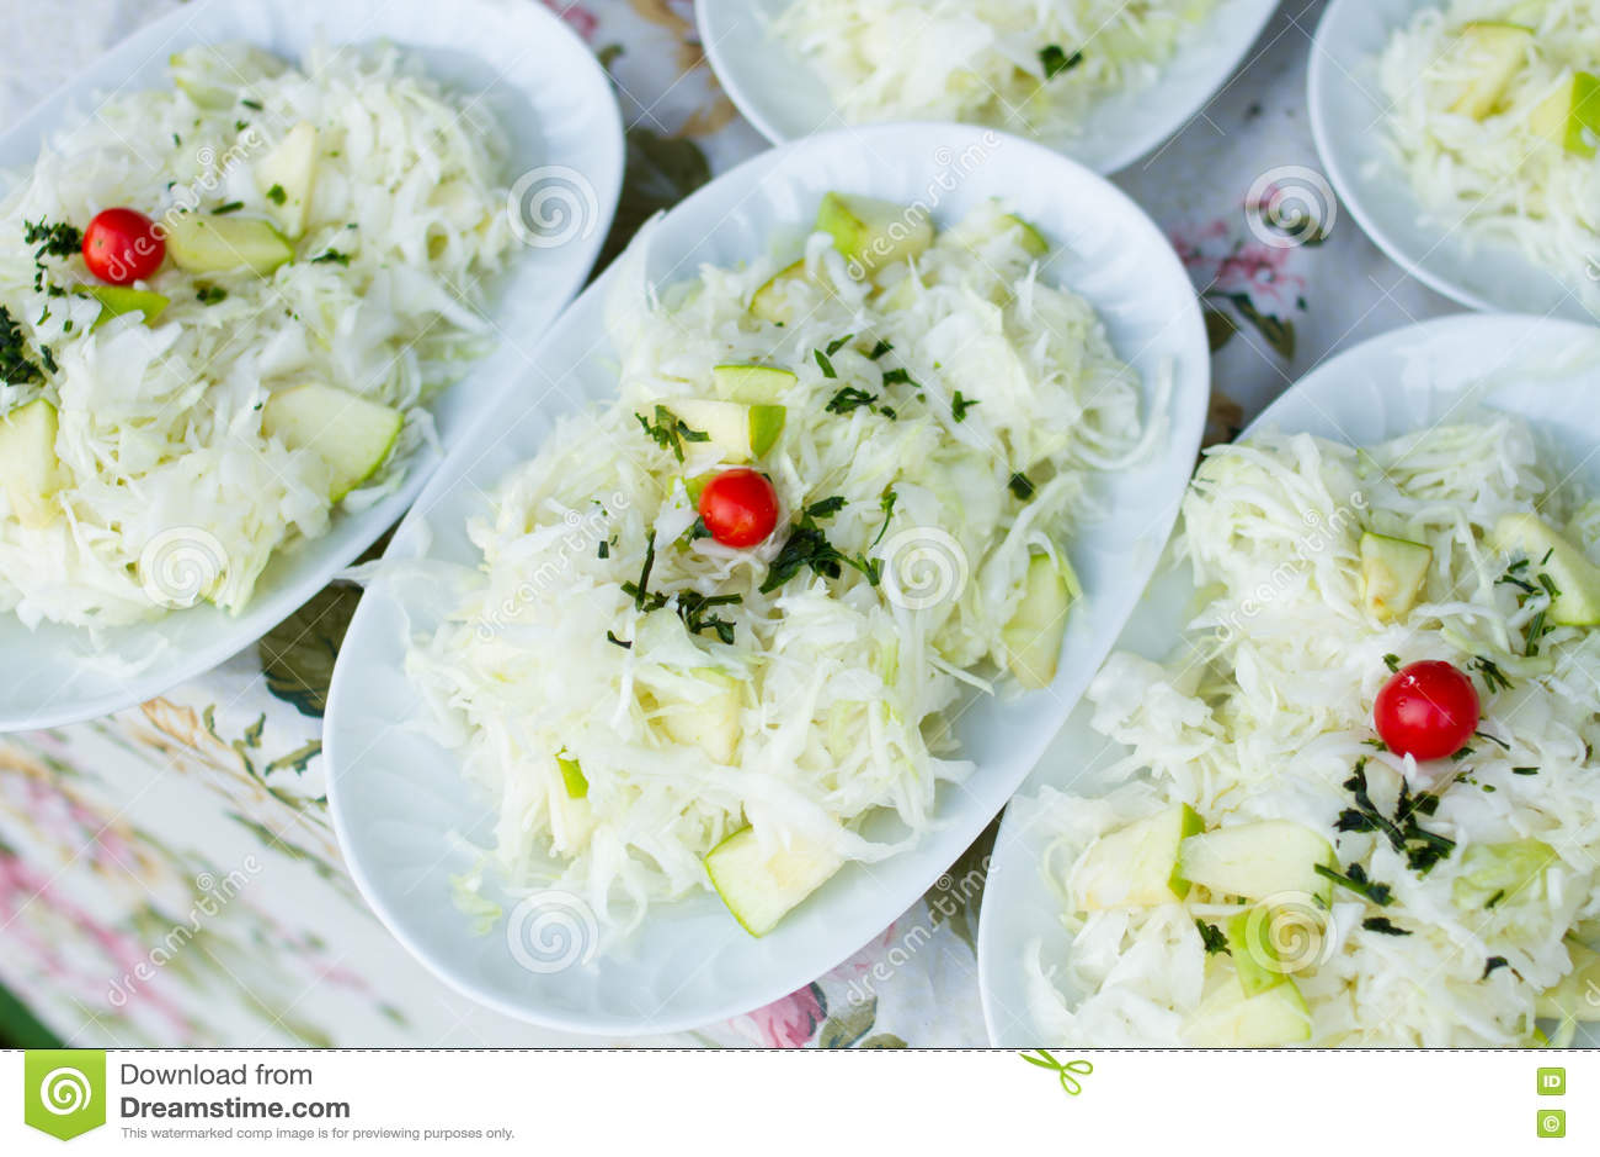 Mélange végétal mariné